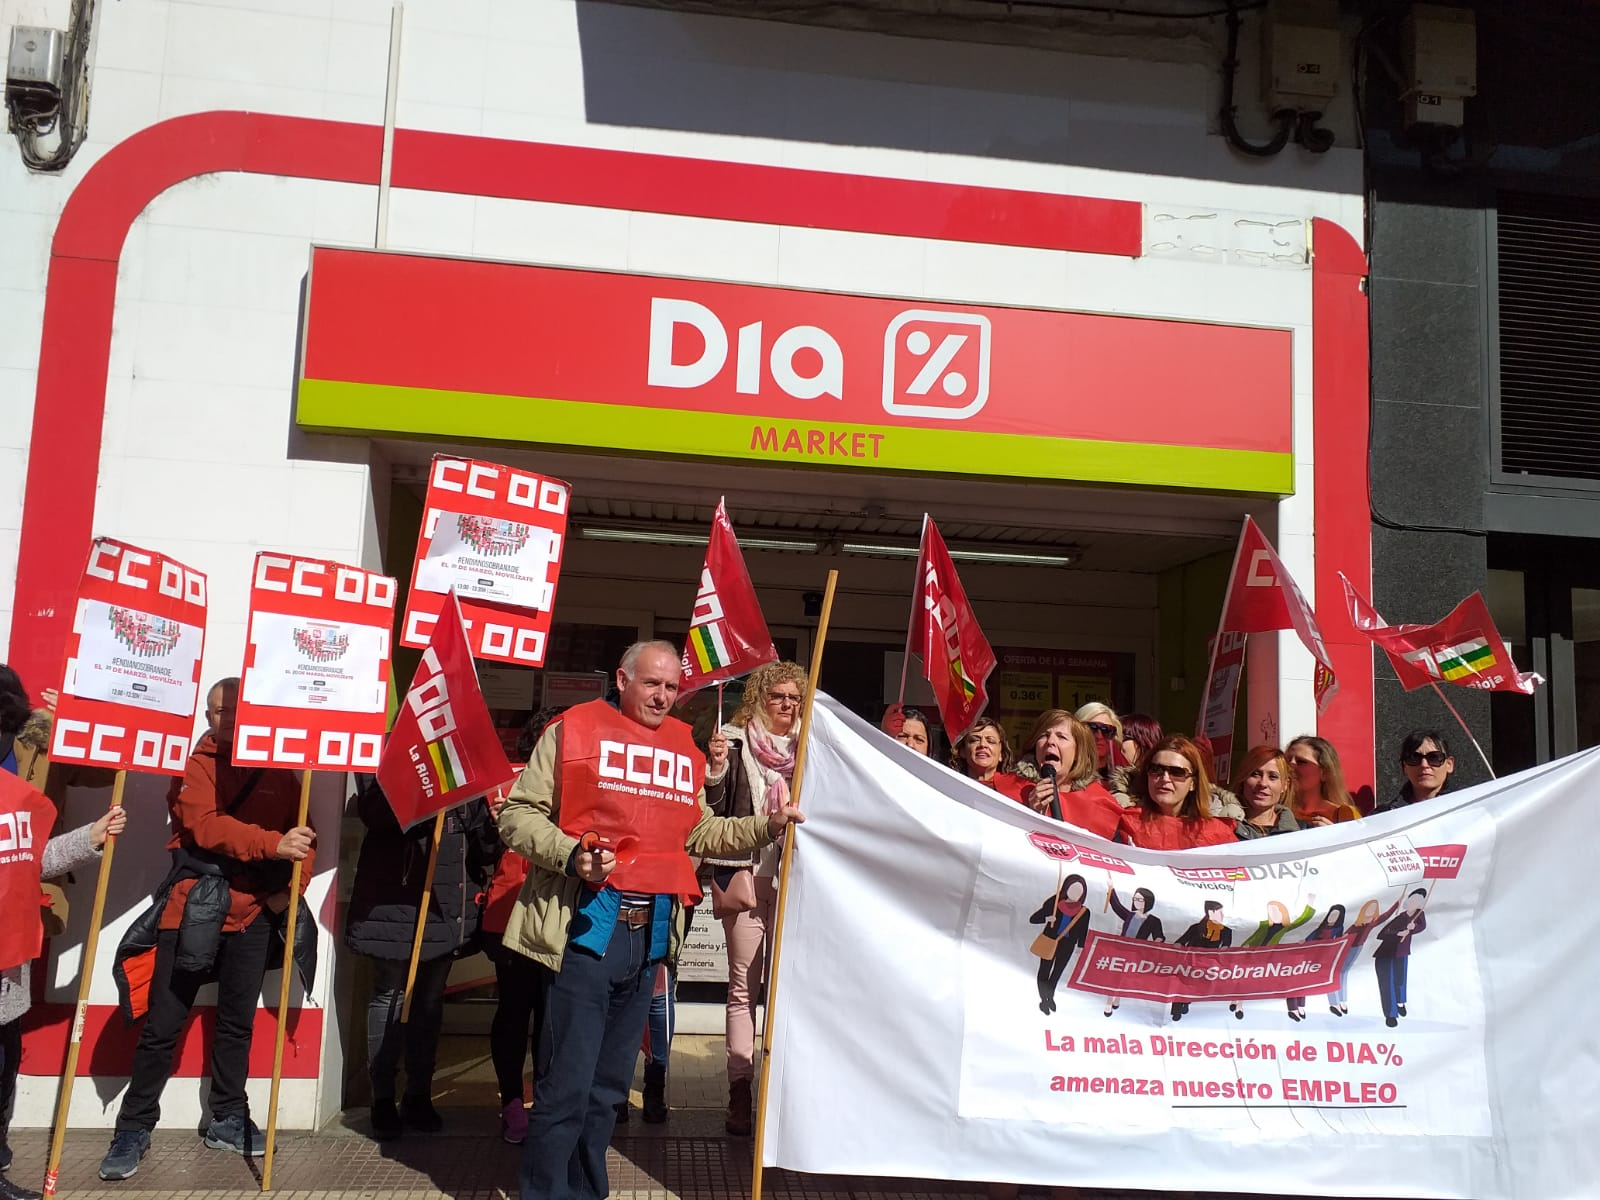 Supermercados Dia. Huelga en La Rioja